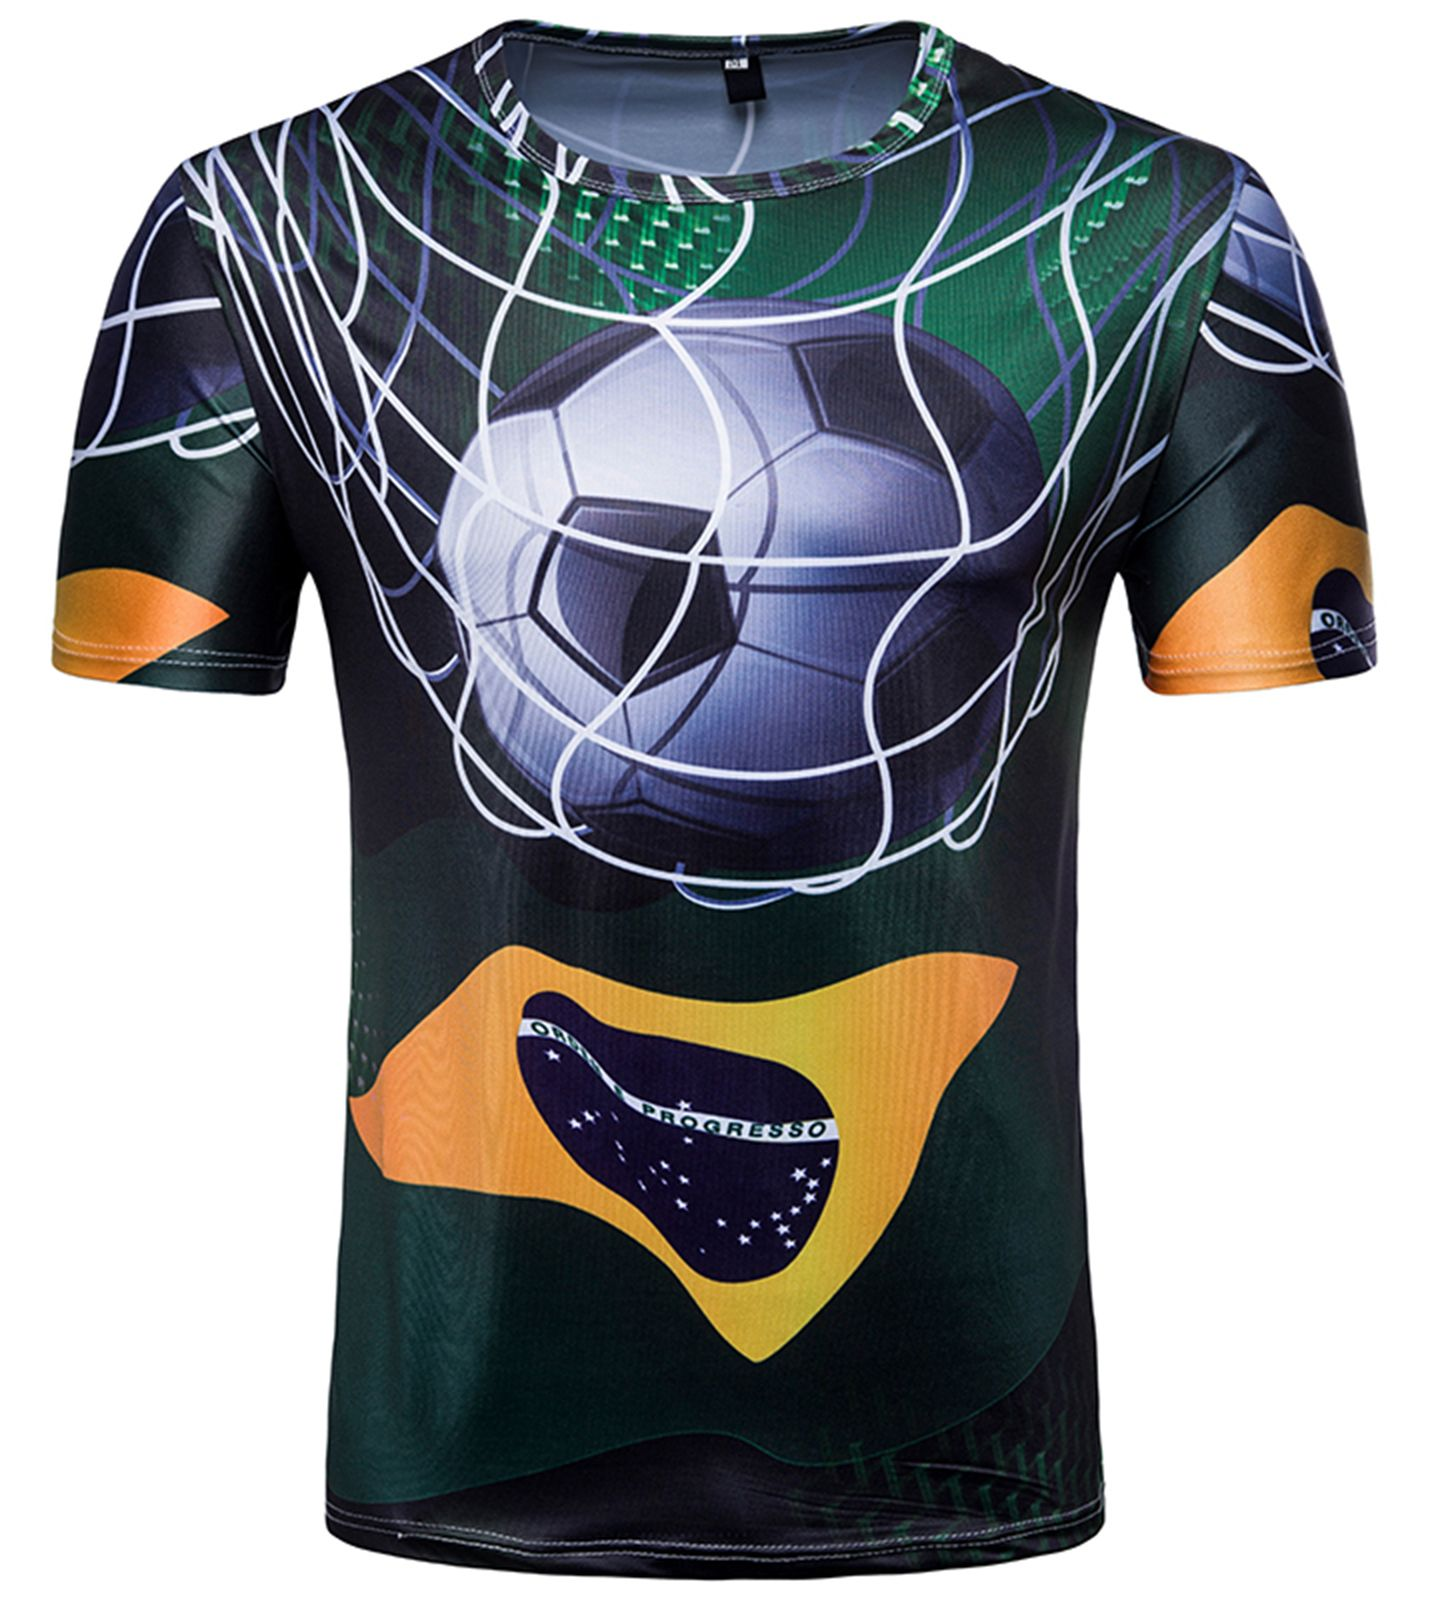 be7a0b18527 Pizoff 2018 FIFA World Cup Hipster Brazil 3D Print Originality T ...